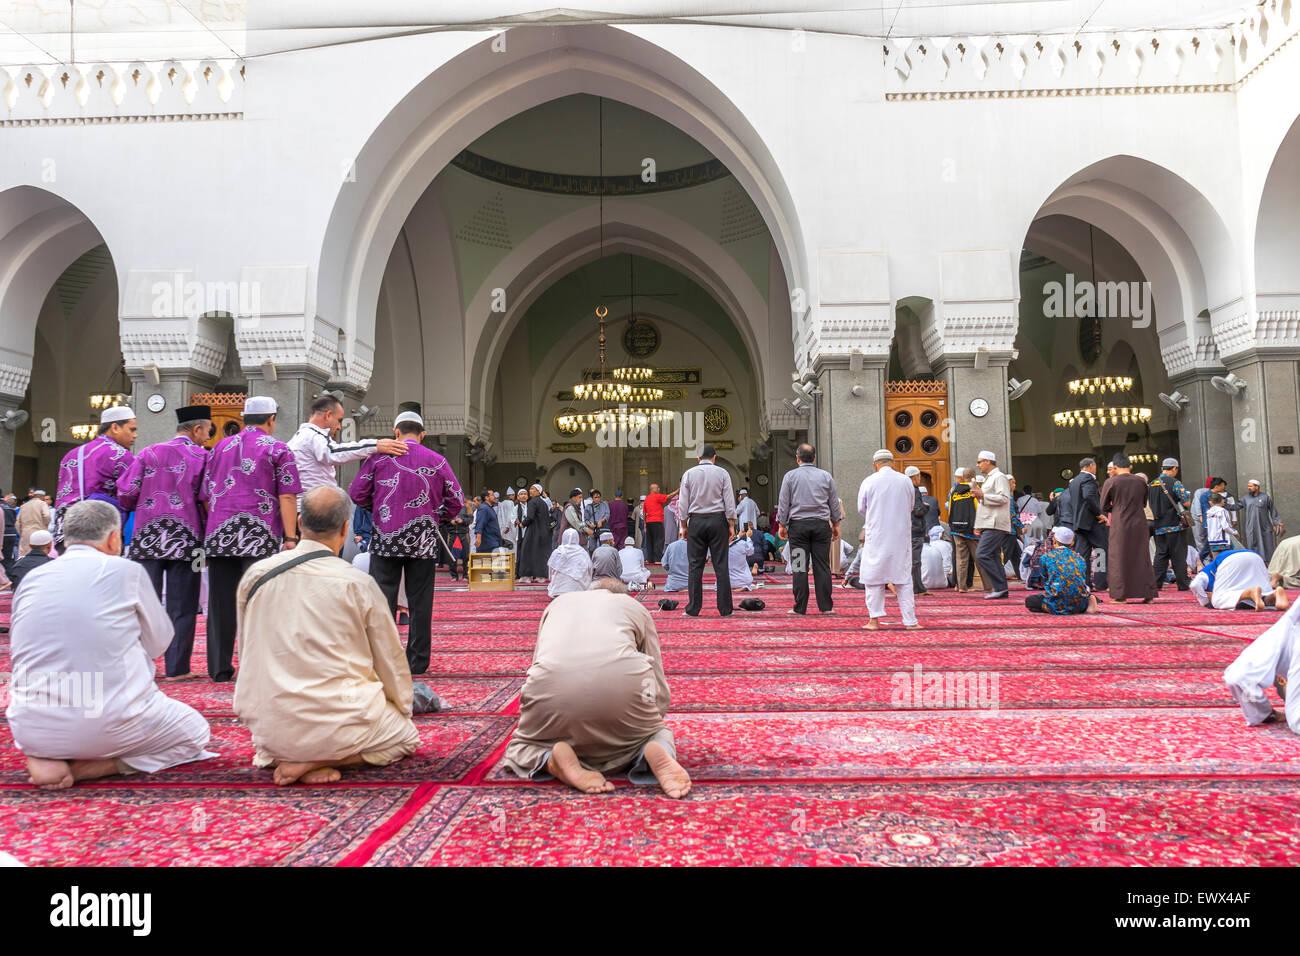 MEDINA, SAUDI ARABIA - MARCH 07, 2015 : Muslims pray inside Masjid Quba in Medina, Saudi Arabia. - Stock Image